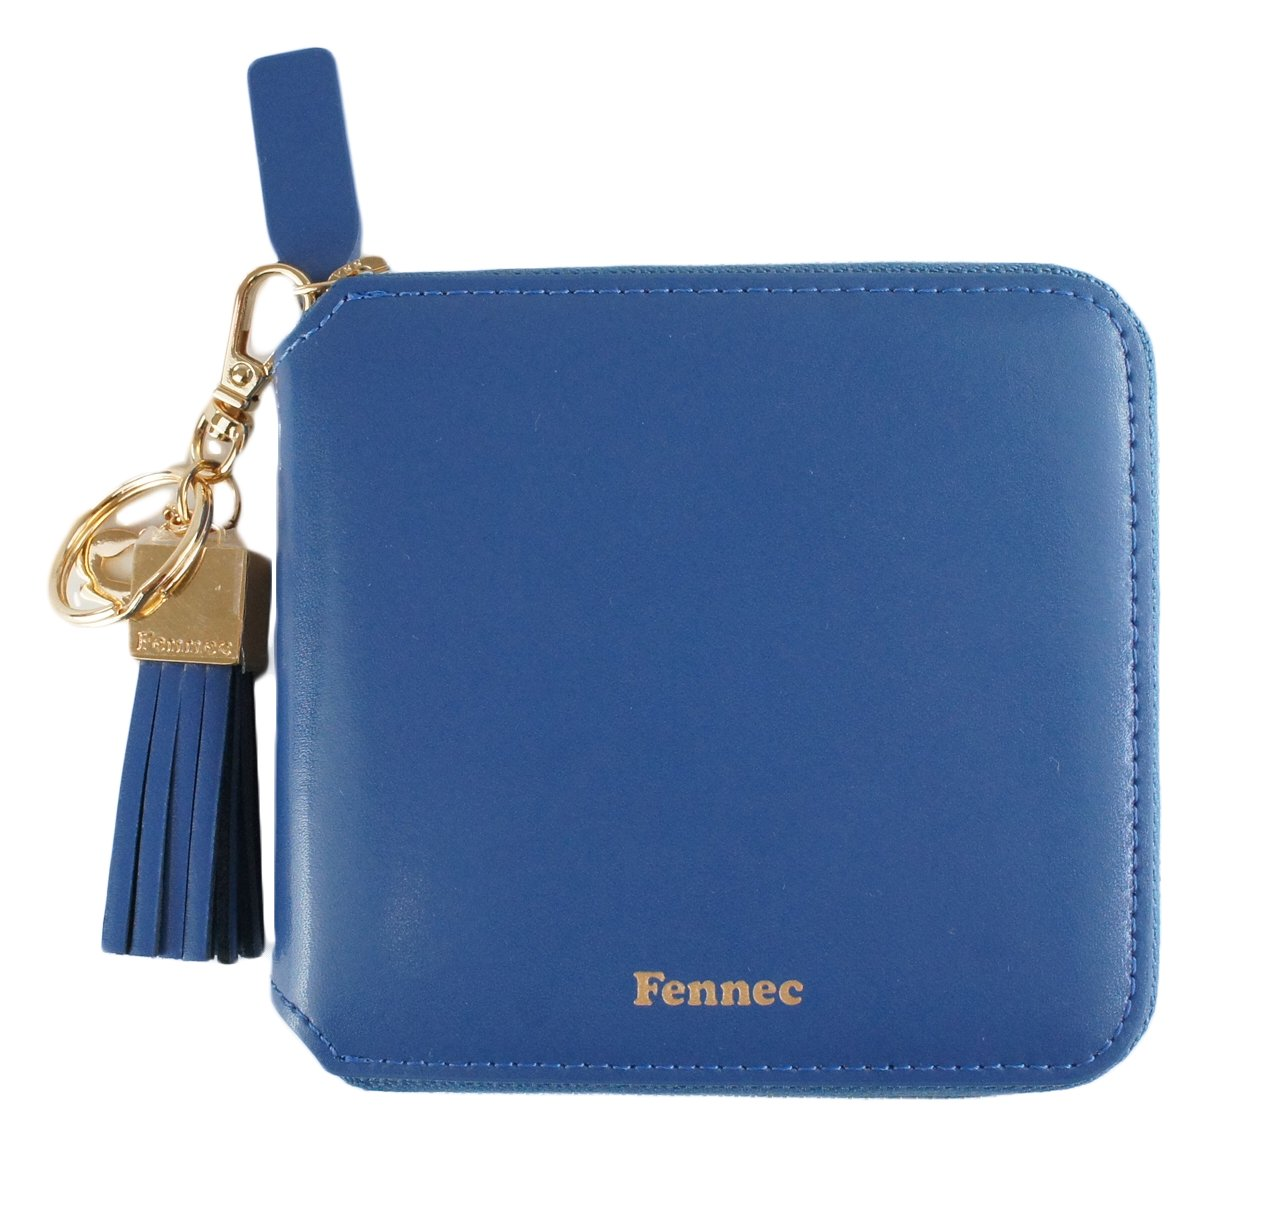 Fennec Zipper Wallet Square Tassel フェネック 二つ折り財布 コインケース付き 【Fennec OFFICIAL】 B0765M21SJ ダスティブルー ダスティブルー